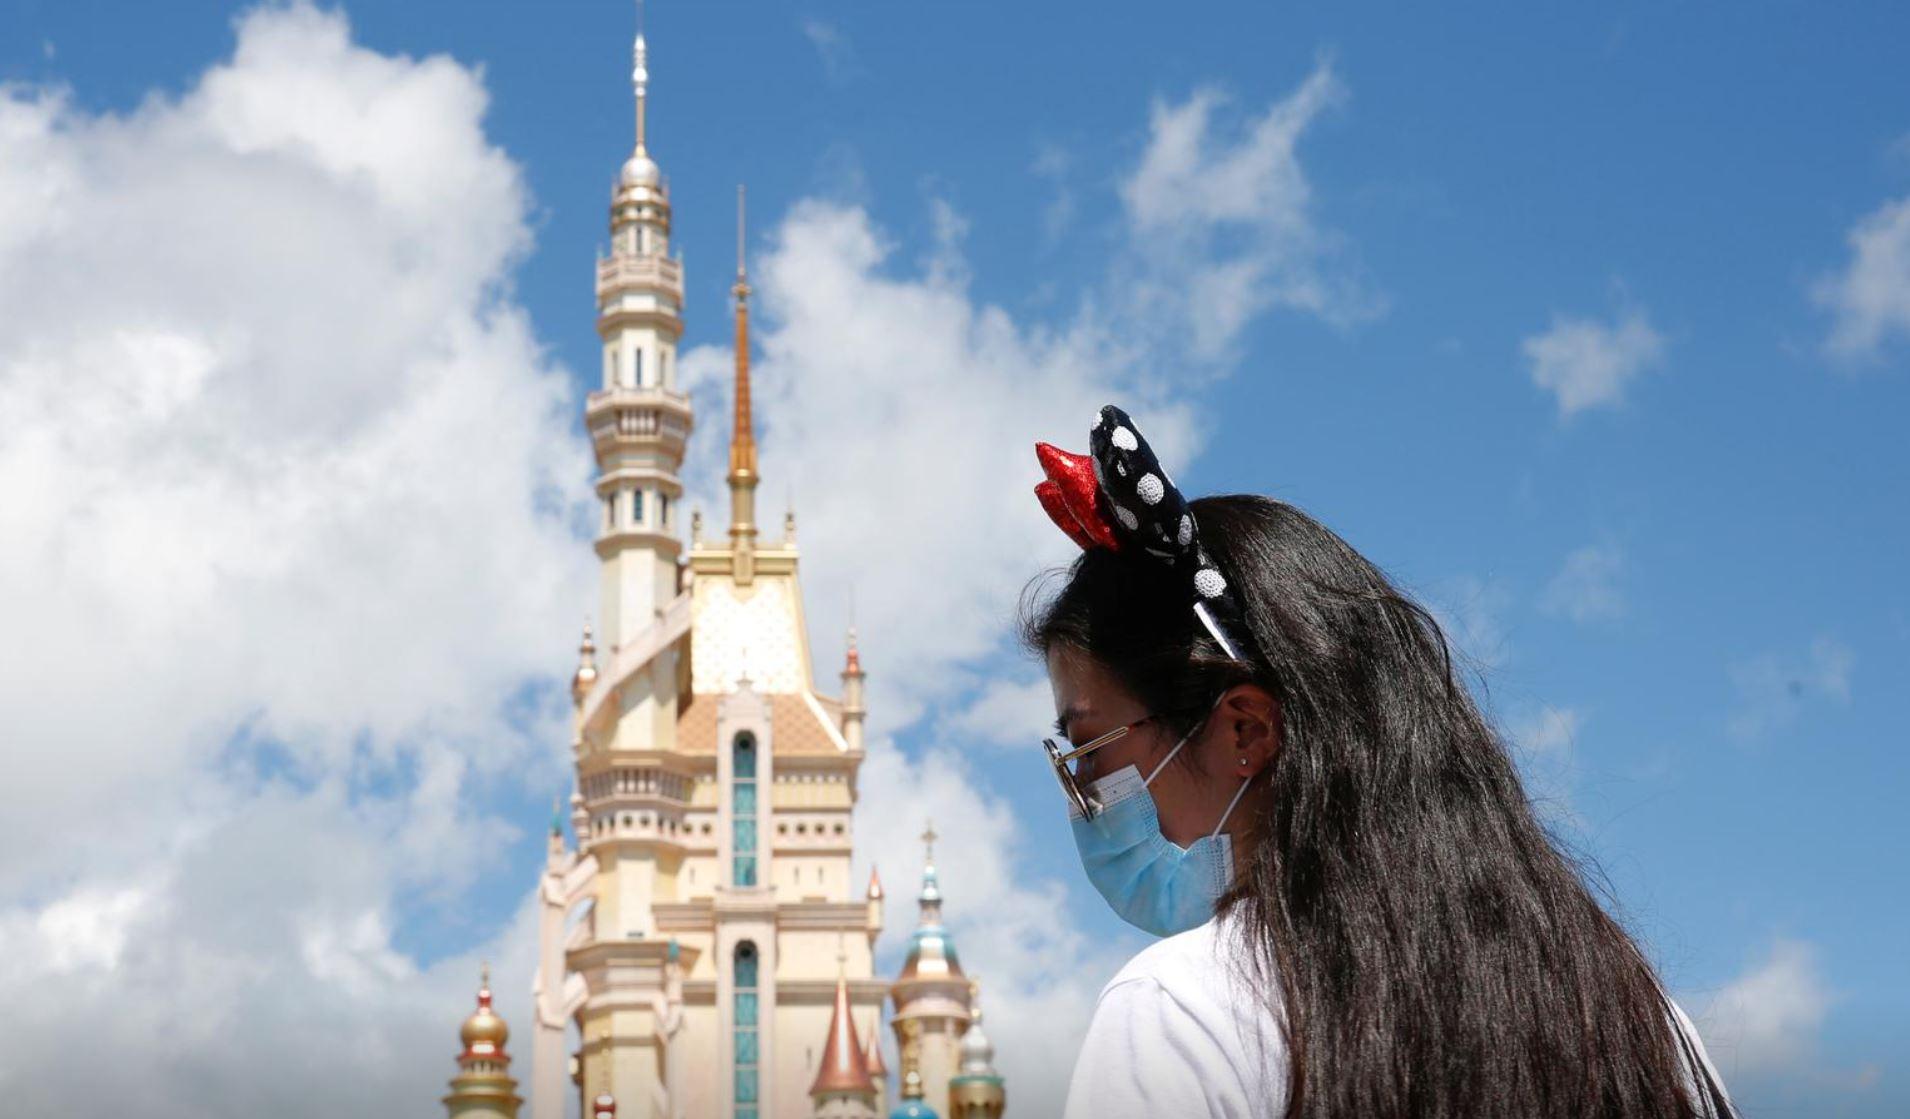 Hong Kong's Disneyland to reopen on September 25